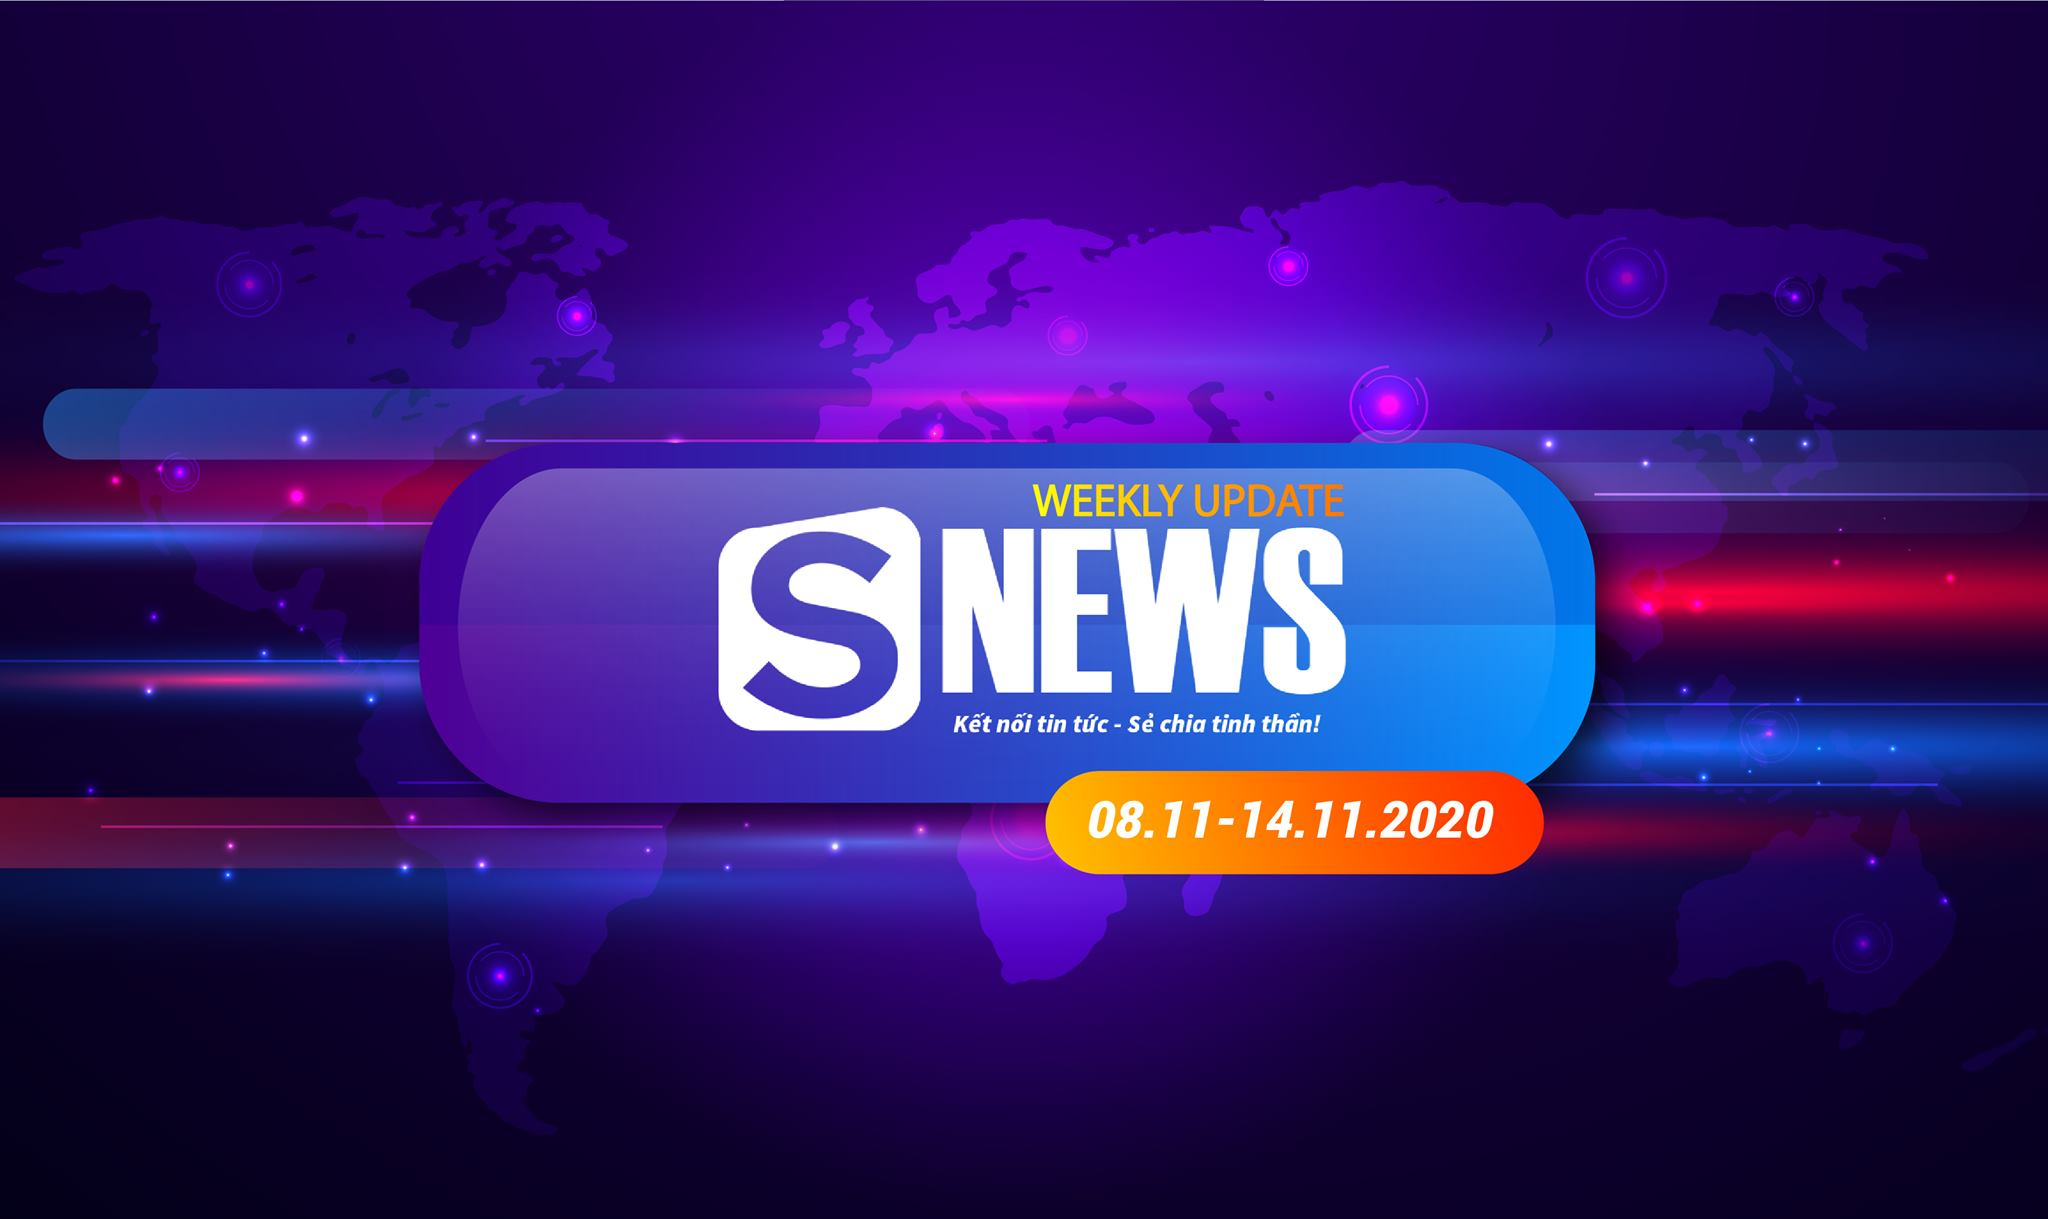 Tổng hợp tin tức Sapo tuần qua: 08.11 - 14.11.2020